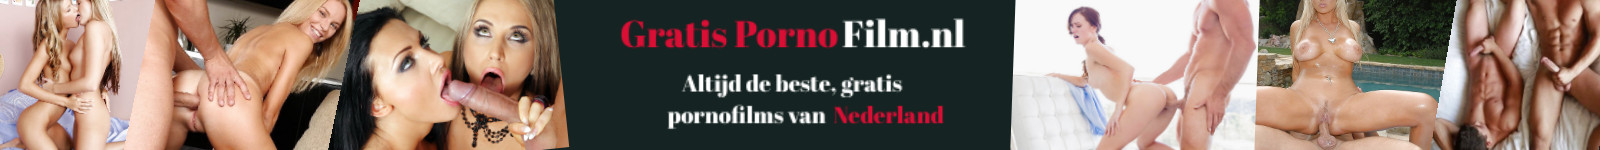 Gratispornofilm.nl